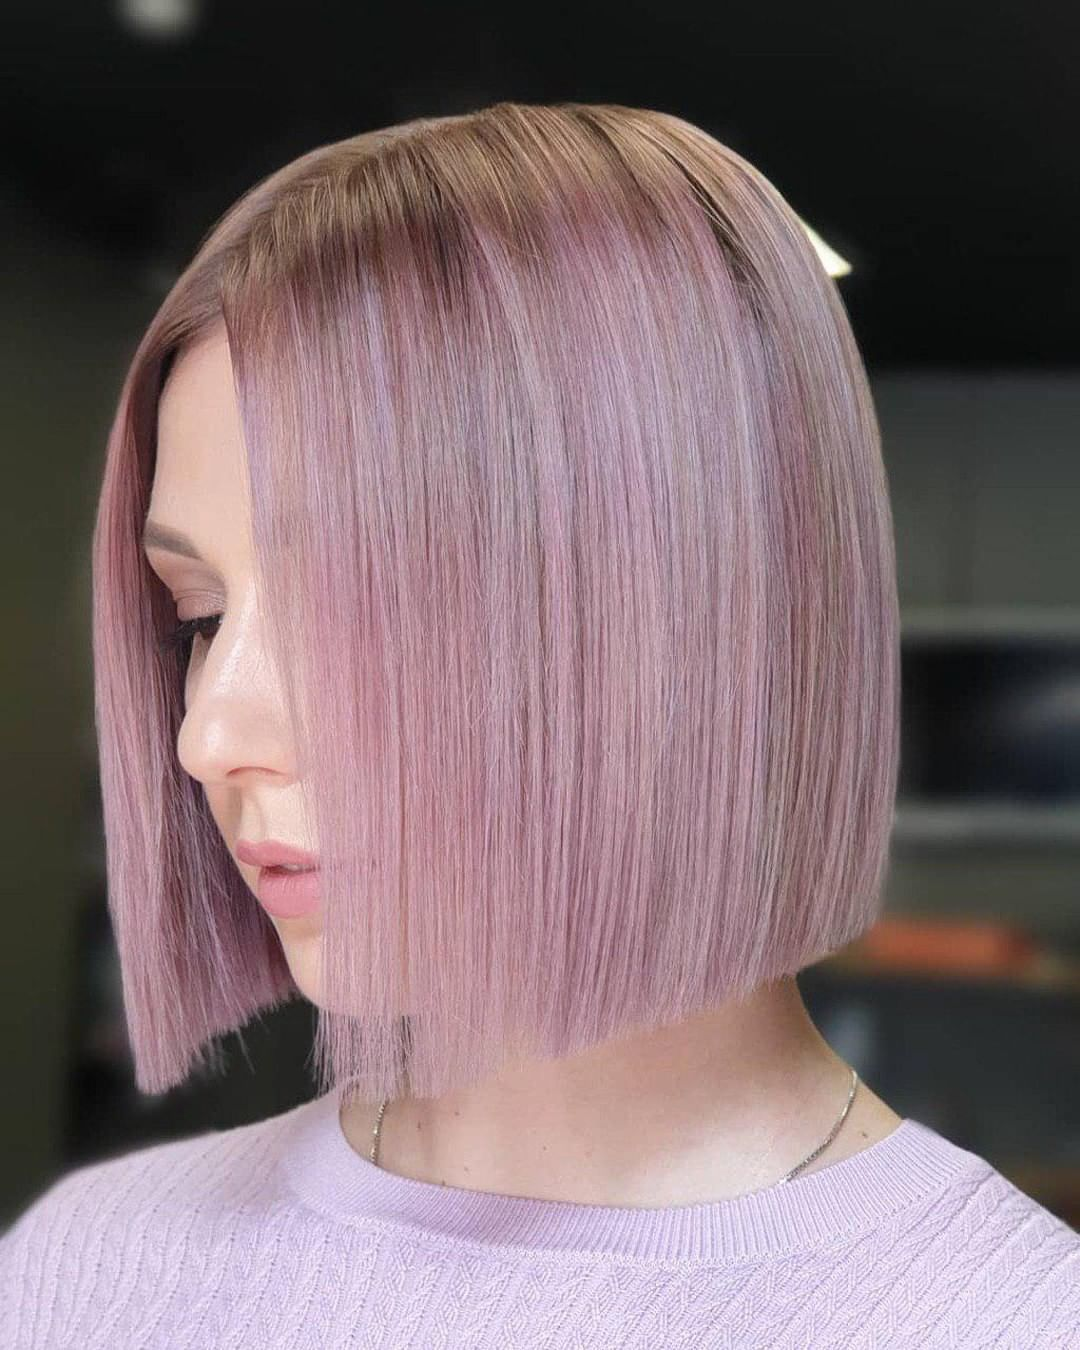 технологии окрашивания волос фото 2